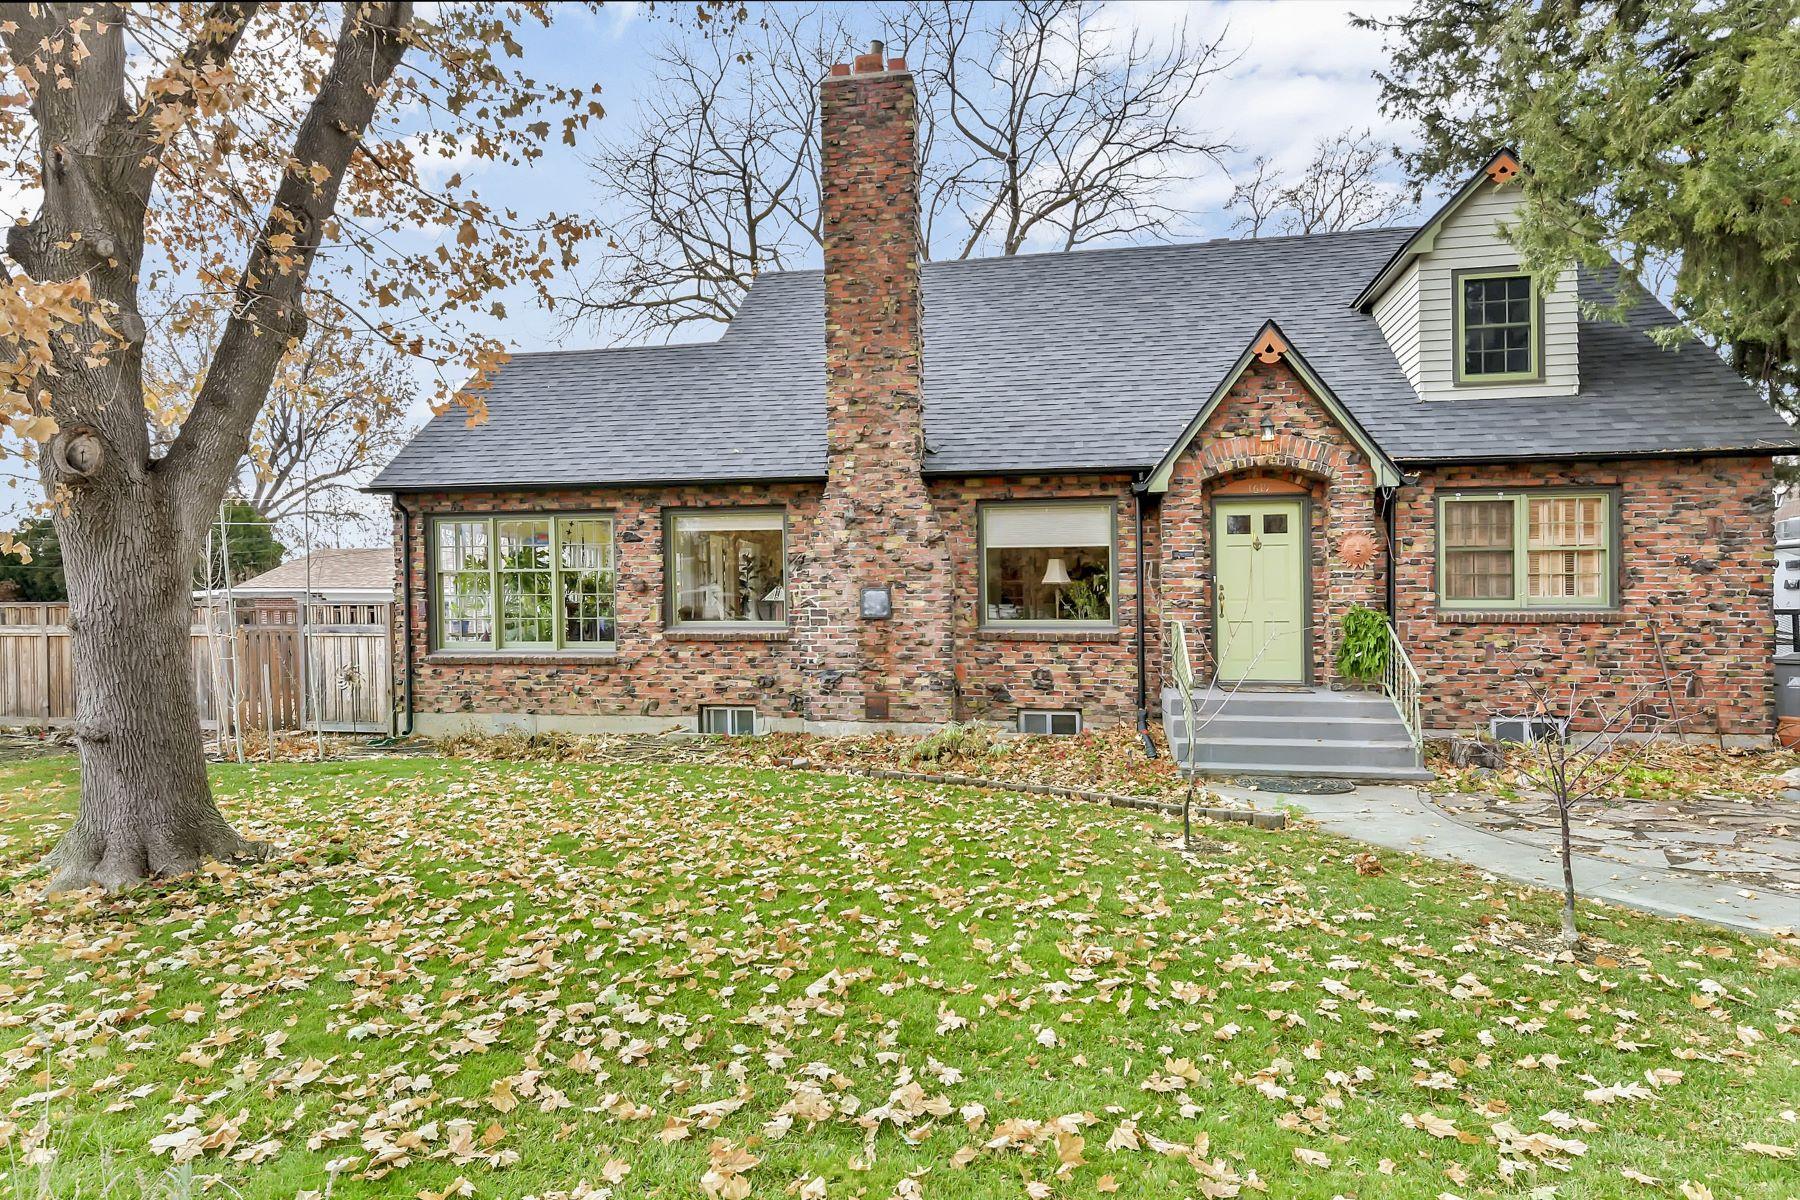 Single Family Homes for Sale at 1619 Pomander Road Boise, Idaho 83705 United States